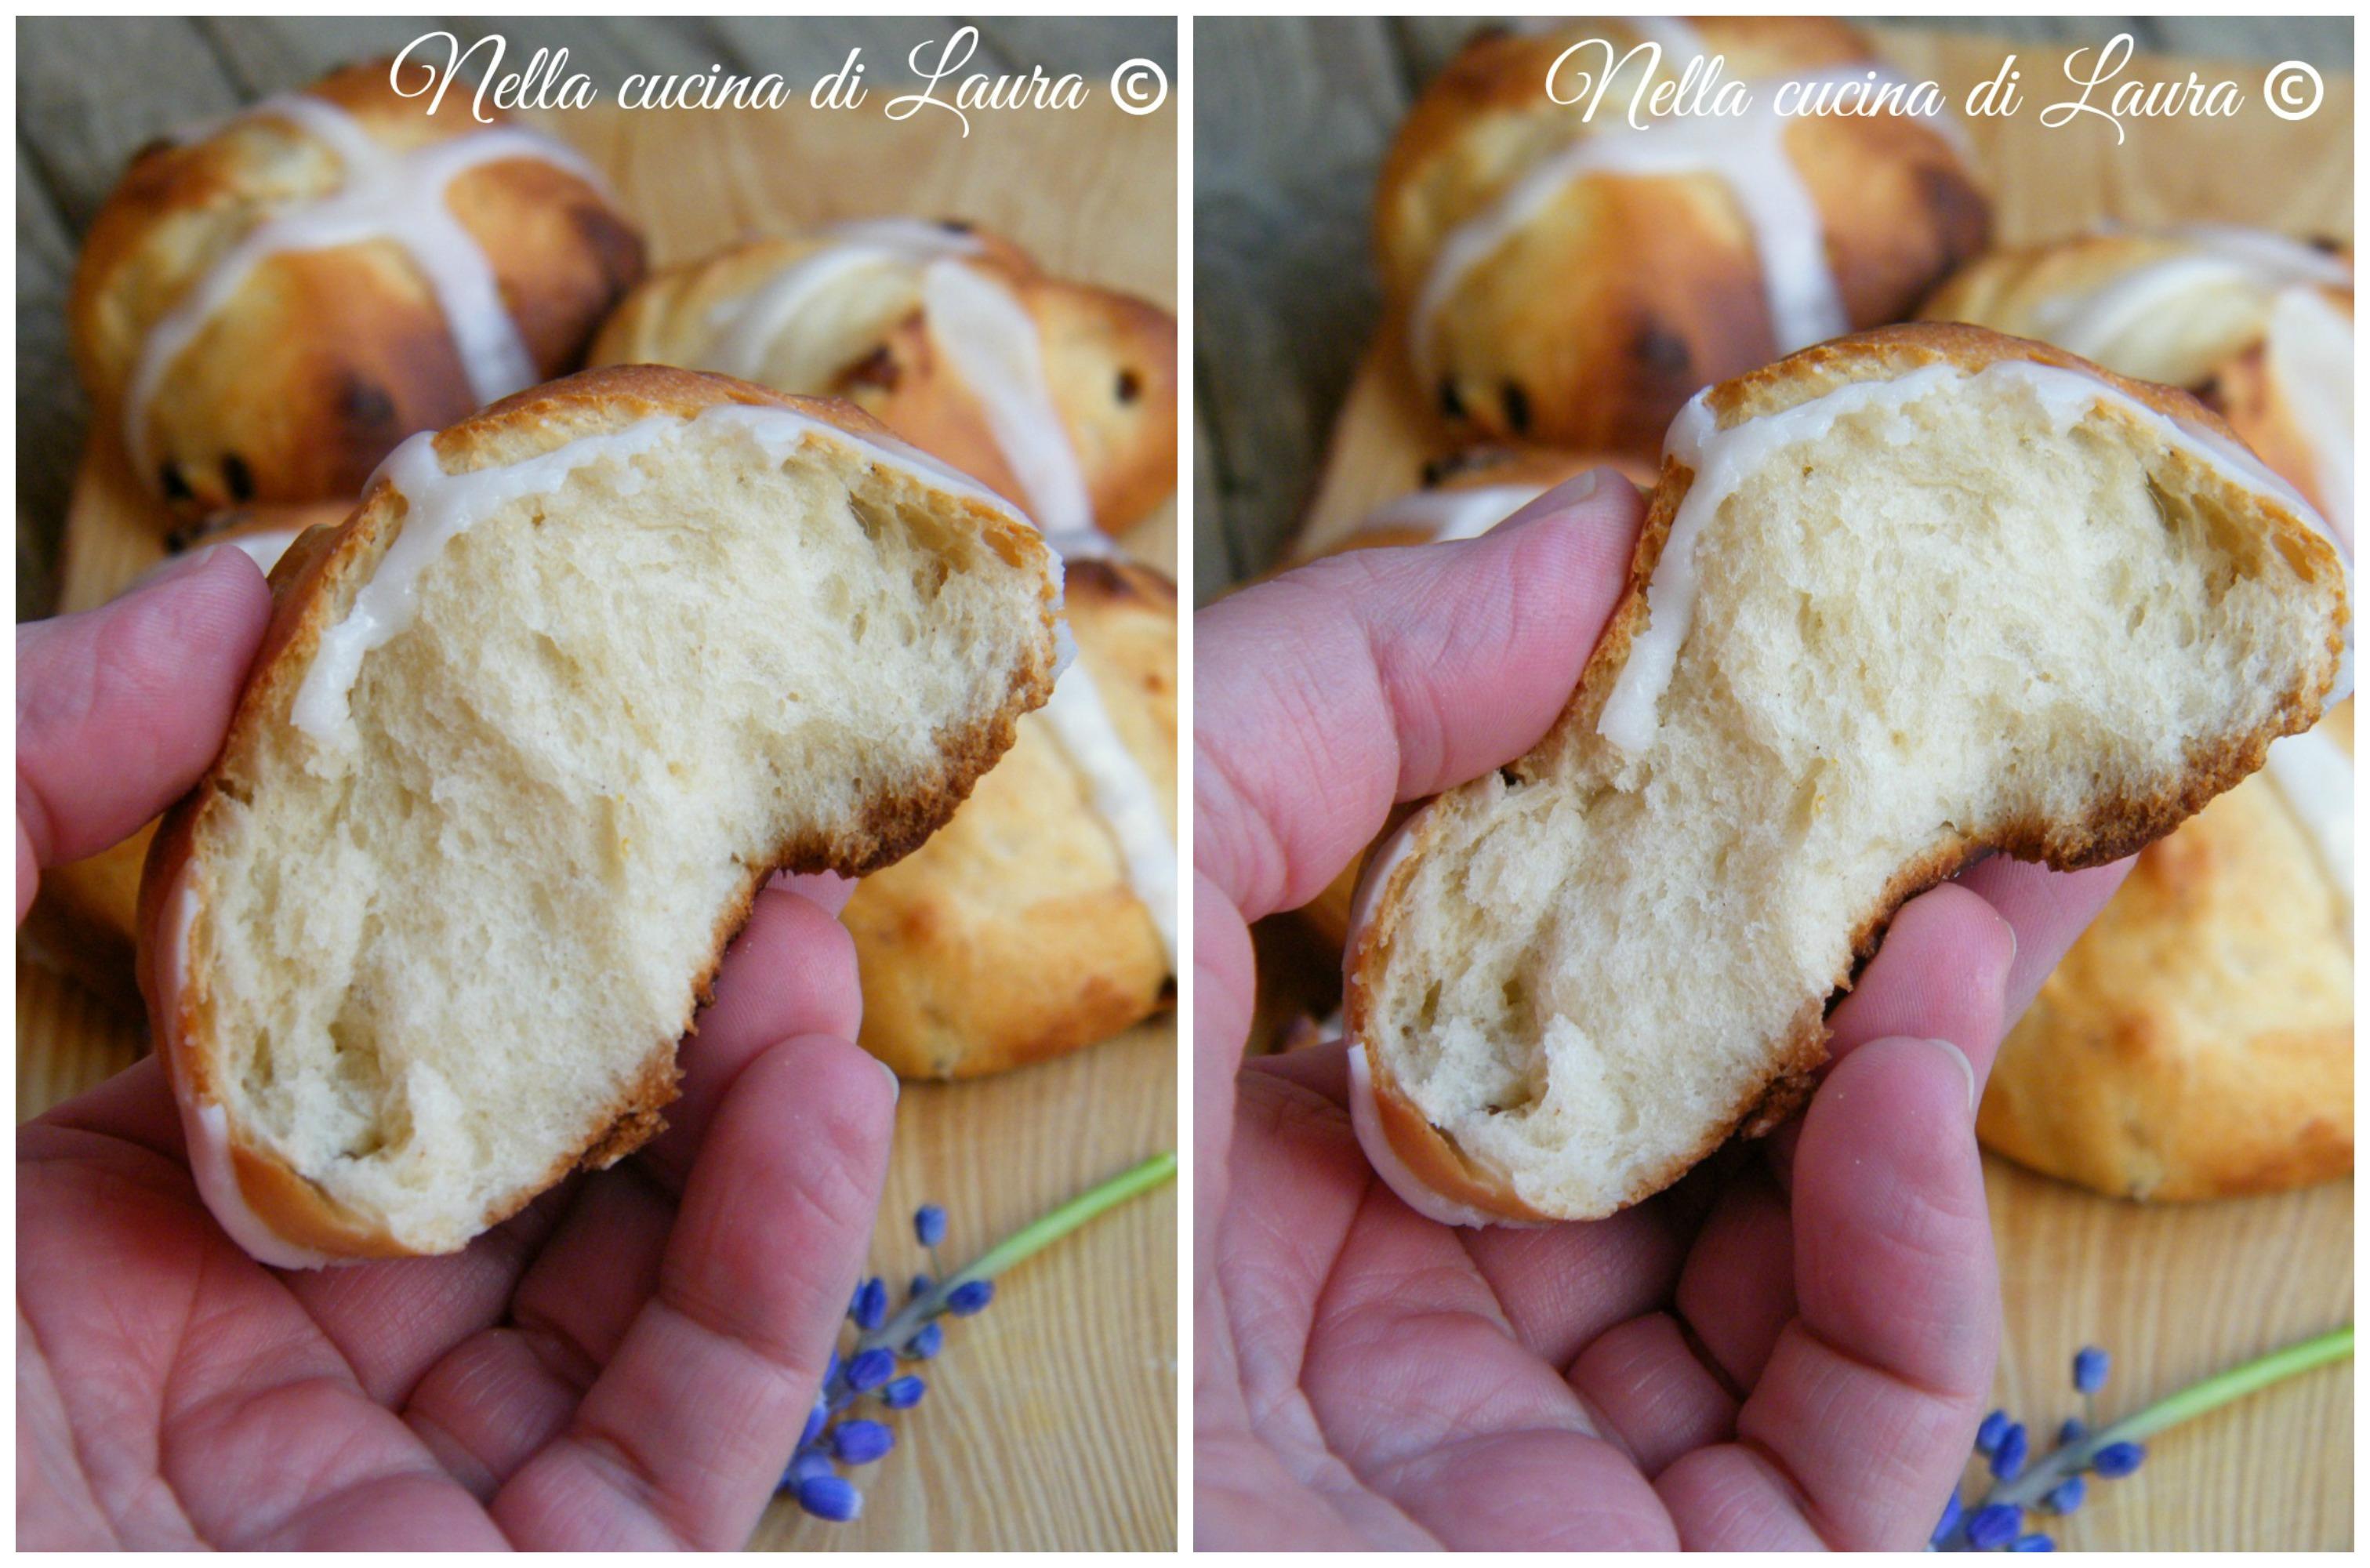 Hot Cross Bung, panini dolci inglesi tipici pasquali - nella cucina di laura